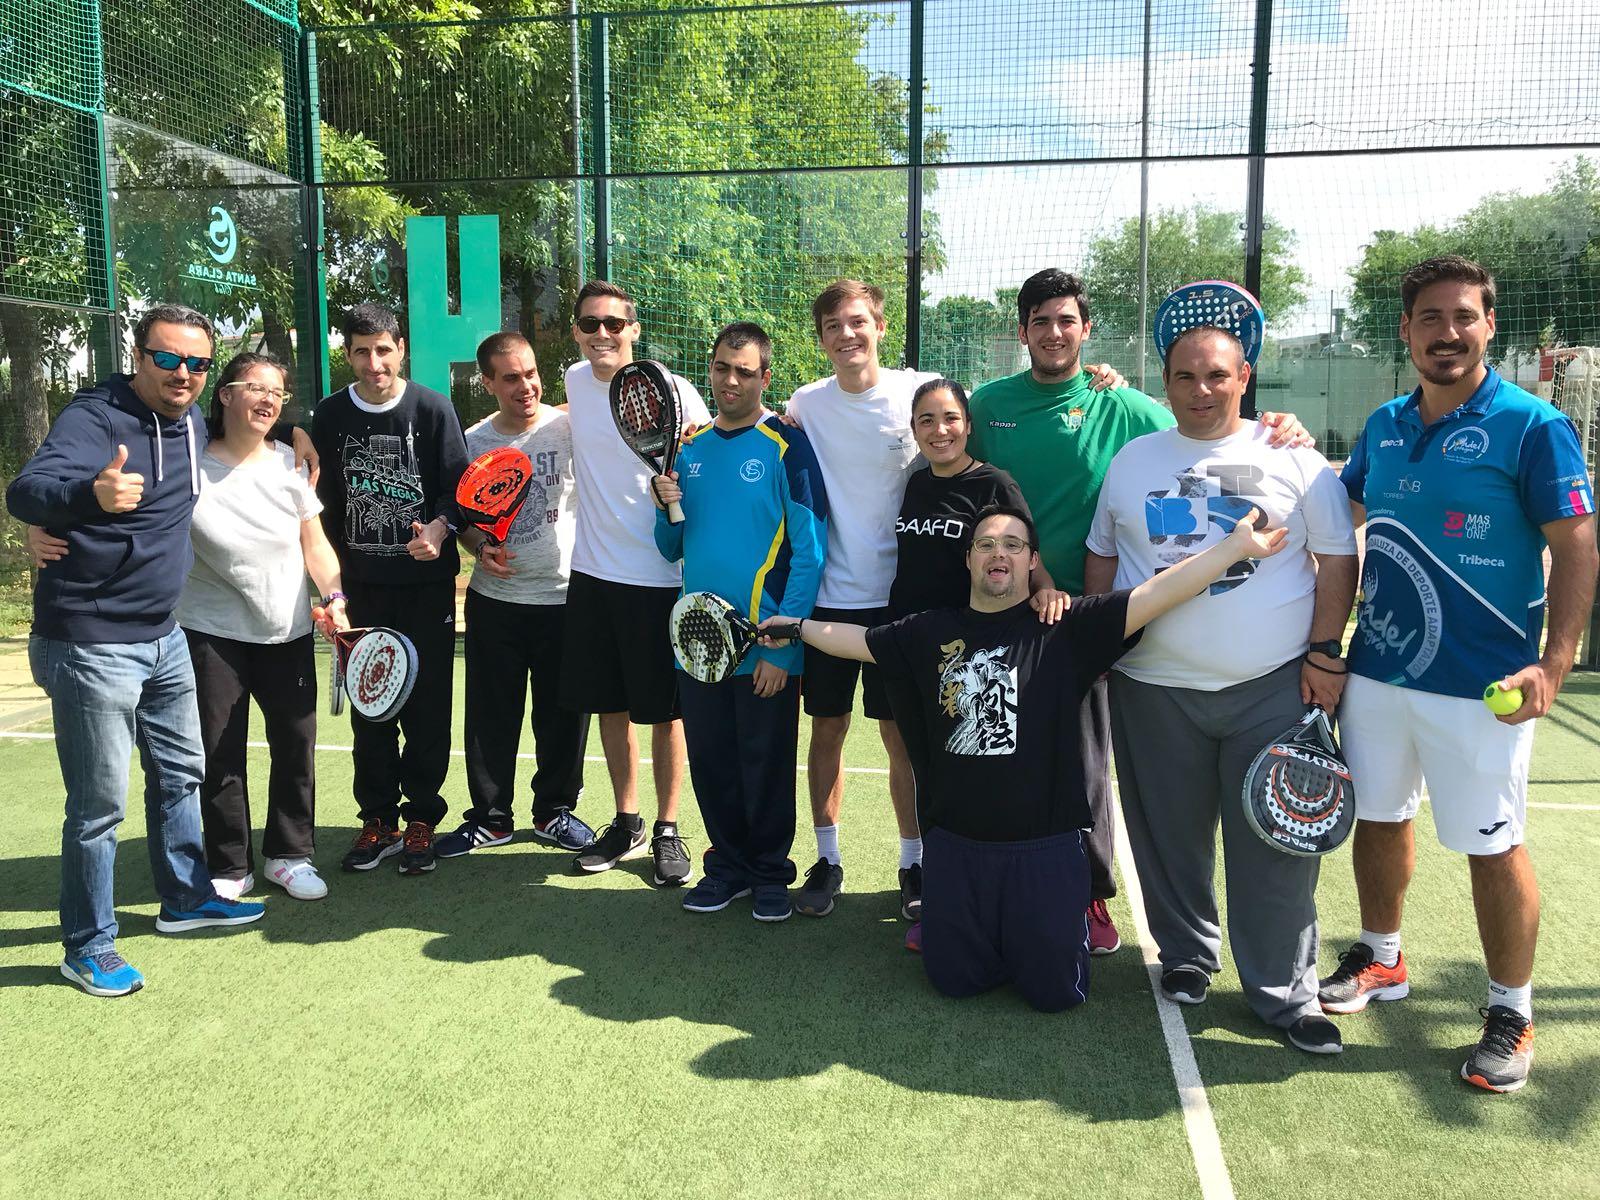 Community Service Organization - Volunteer Abroad in Spain!  4